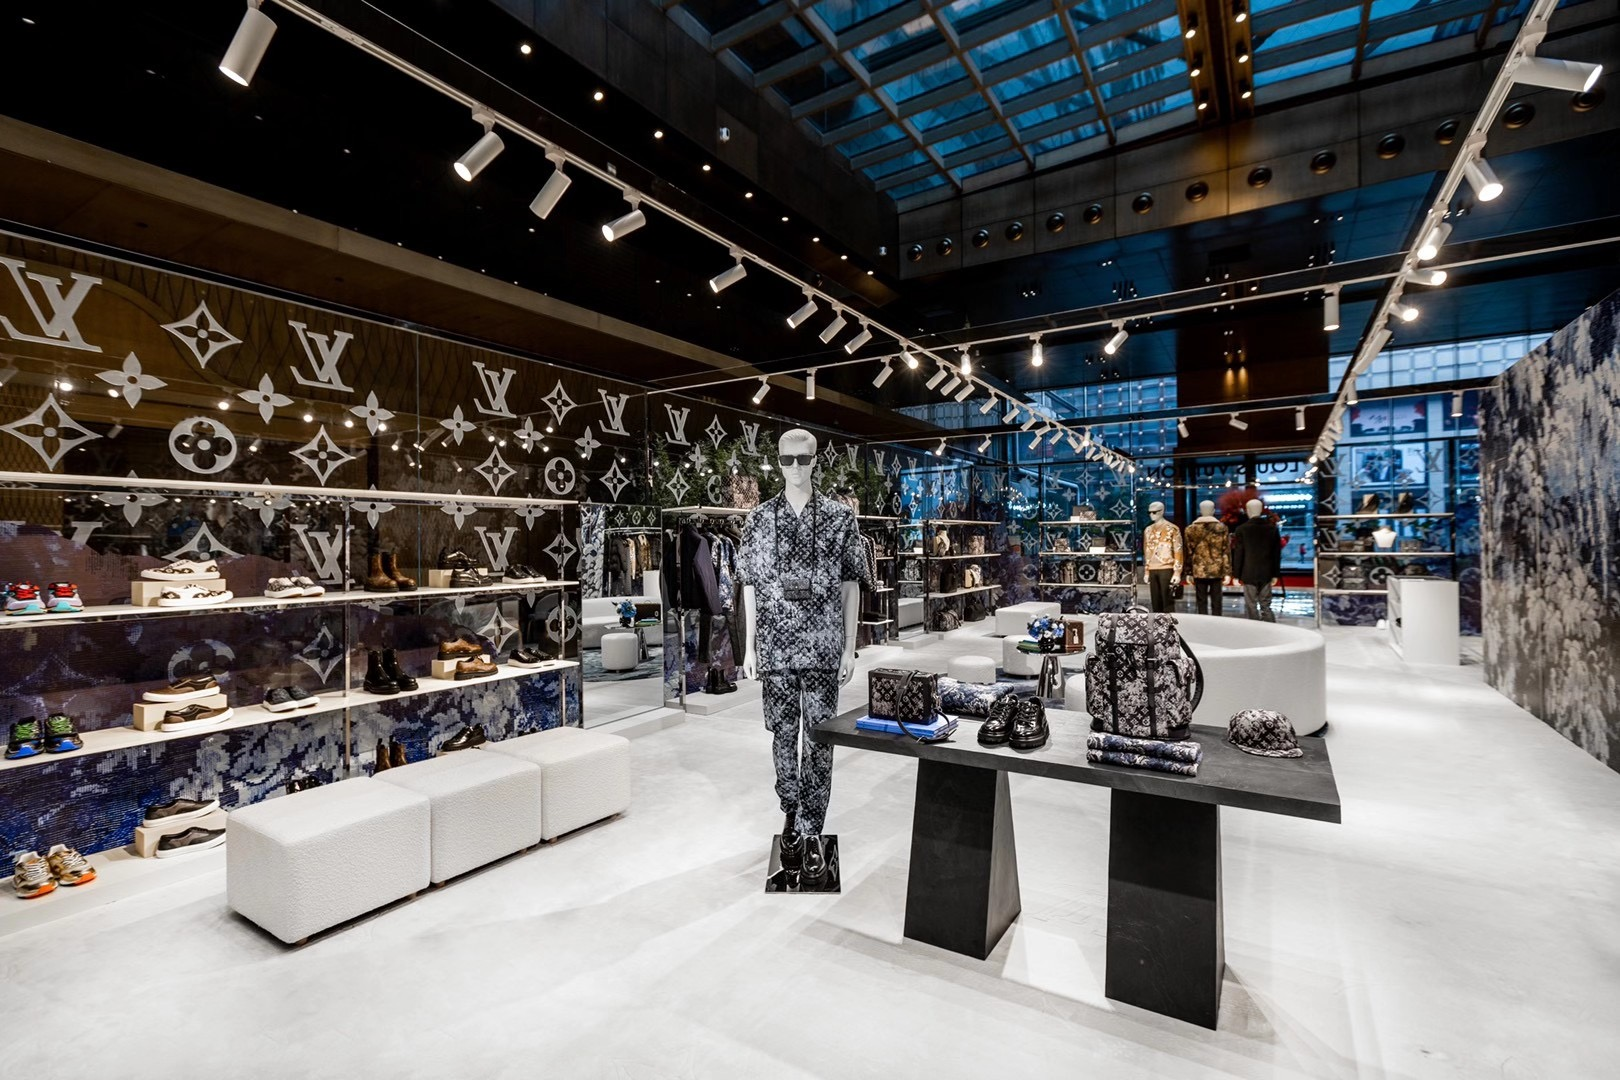 Louis Vuitton 2020 Men's Pre-Coll Pop Up Nov 13th – Dec 13th Harbin/Jinan/Xi'an – 3